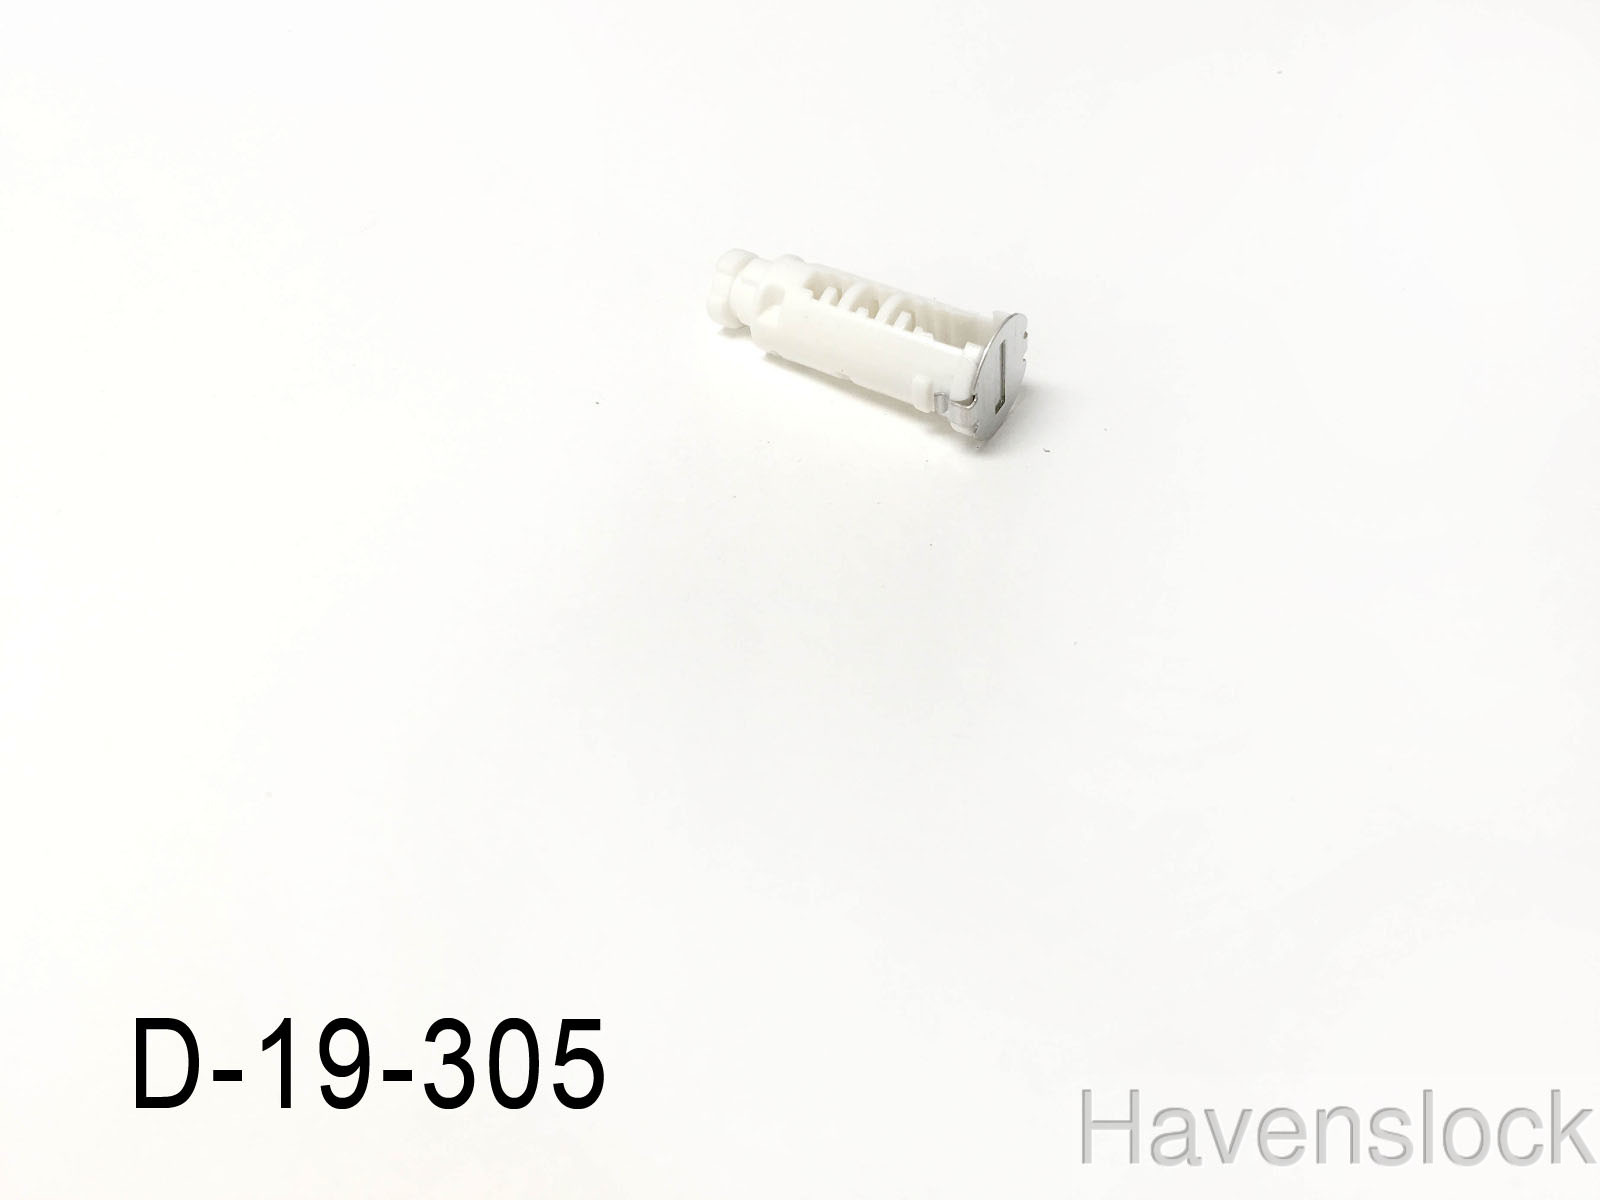 ASP Door Lock D-19-305, for Honda, uncoded, X128/